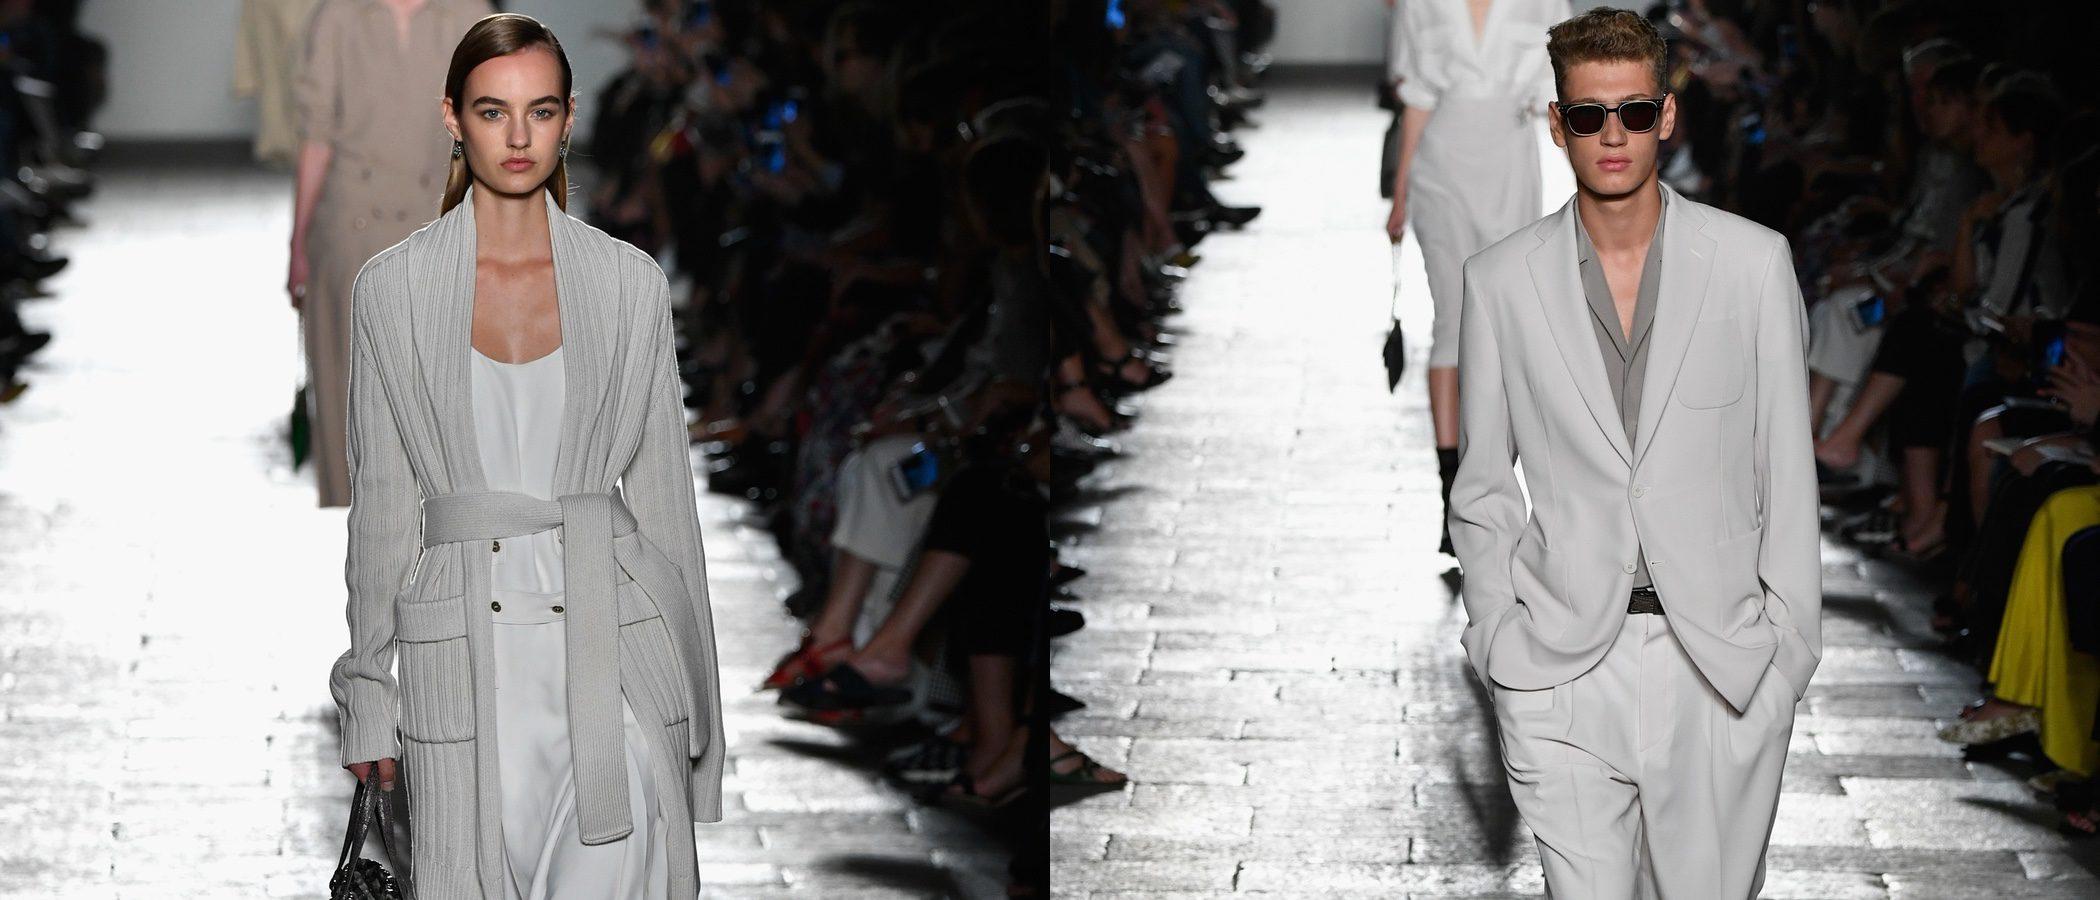 Bottega Veneta realizará desfiles mixtos en las próximas temporadas a partir de 2017